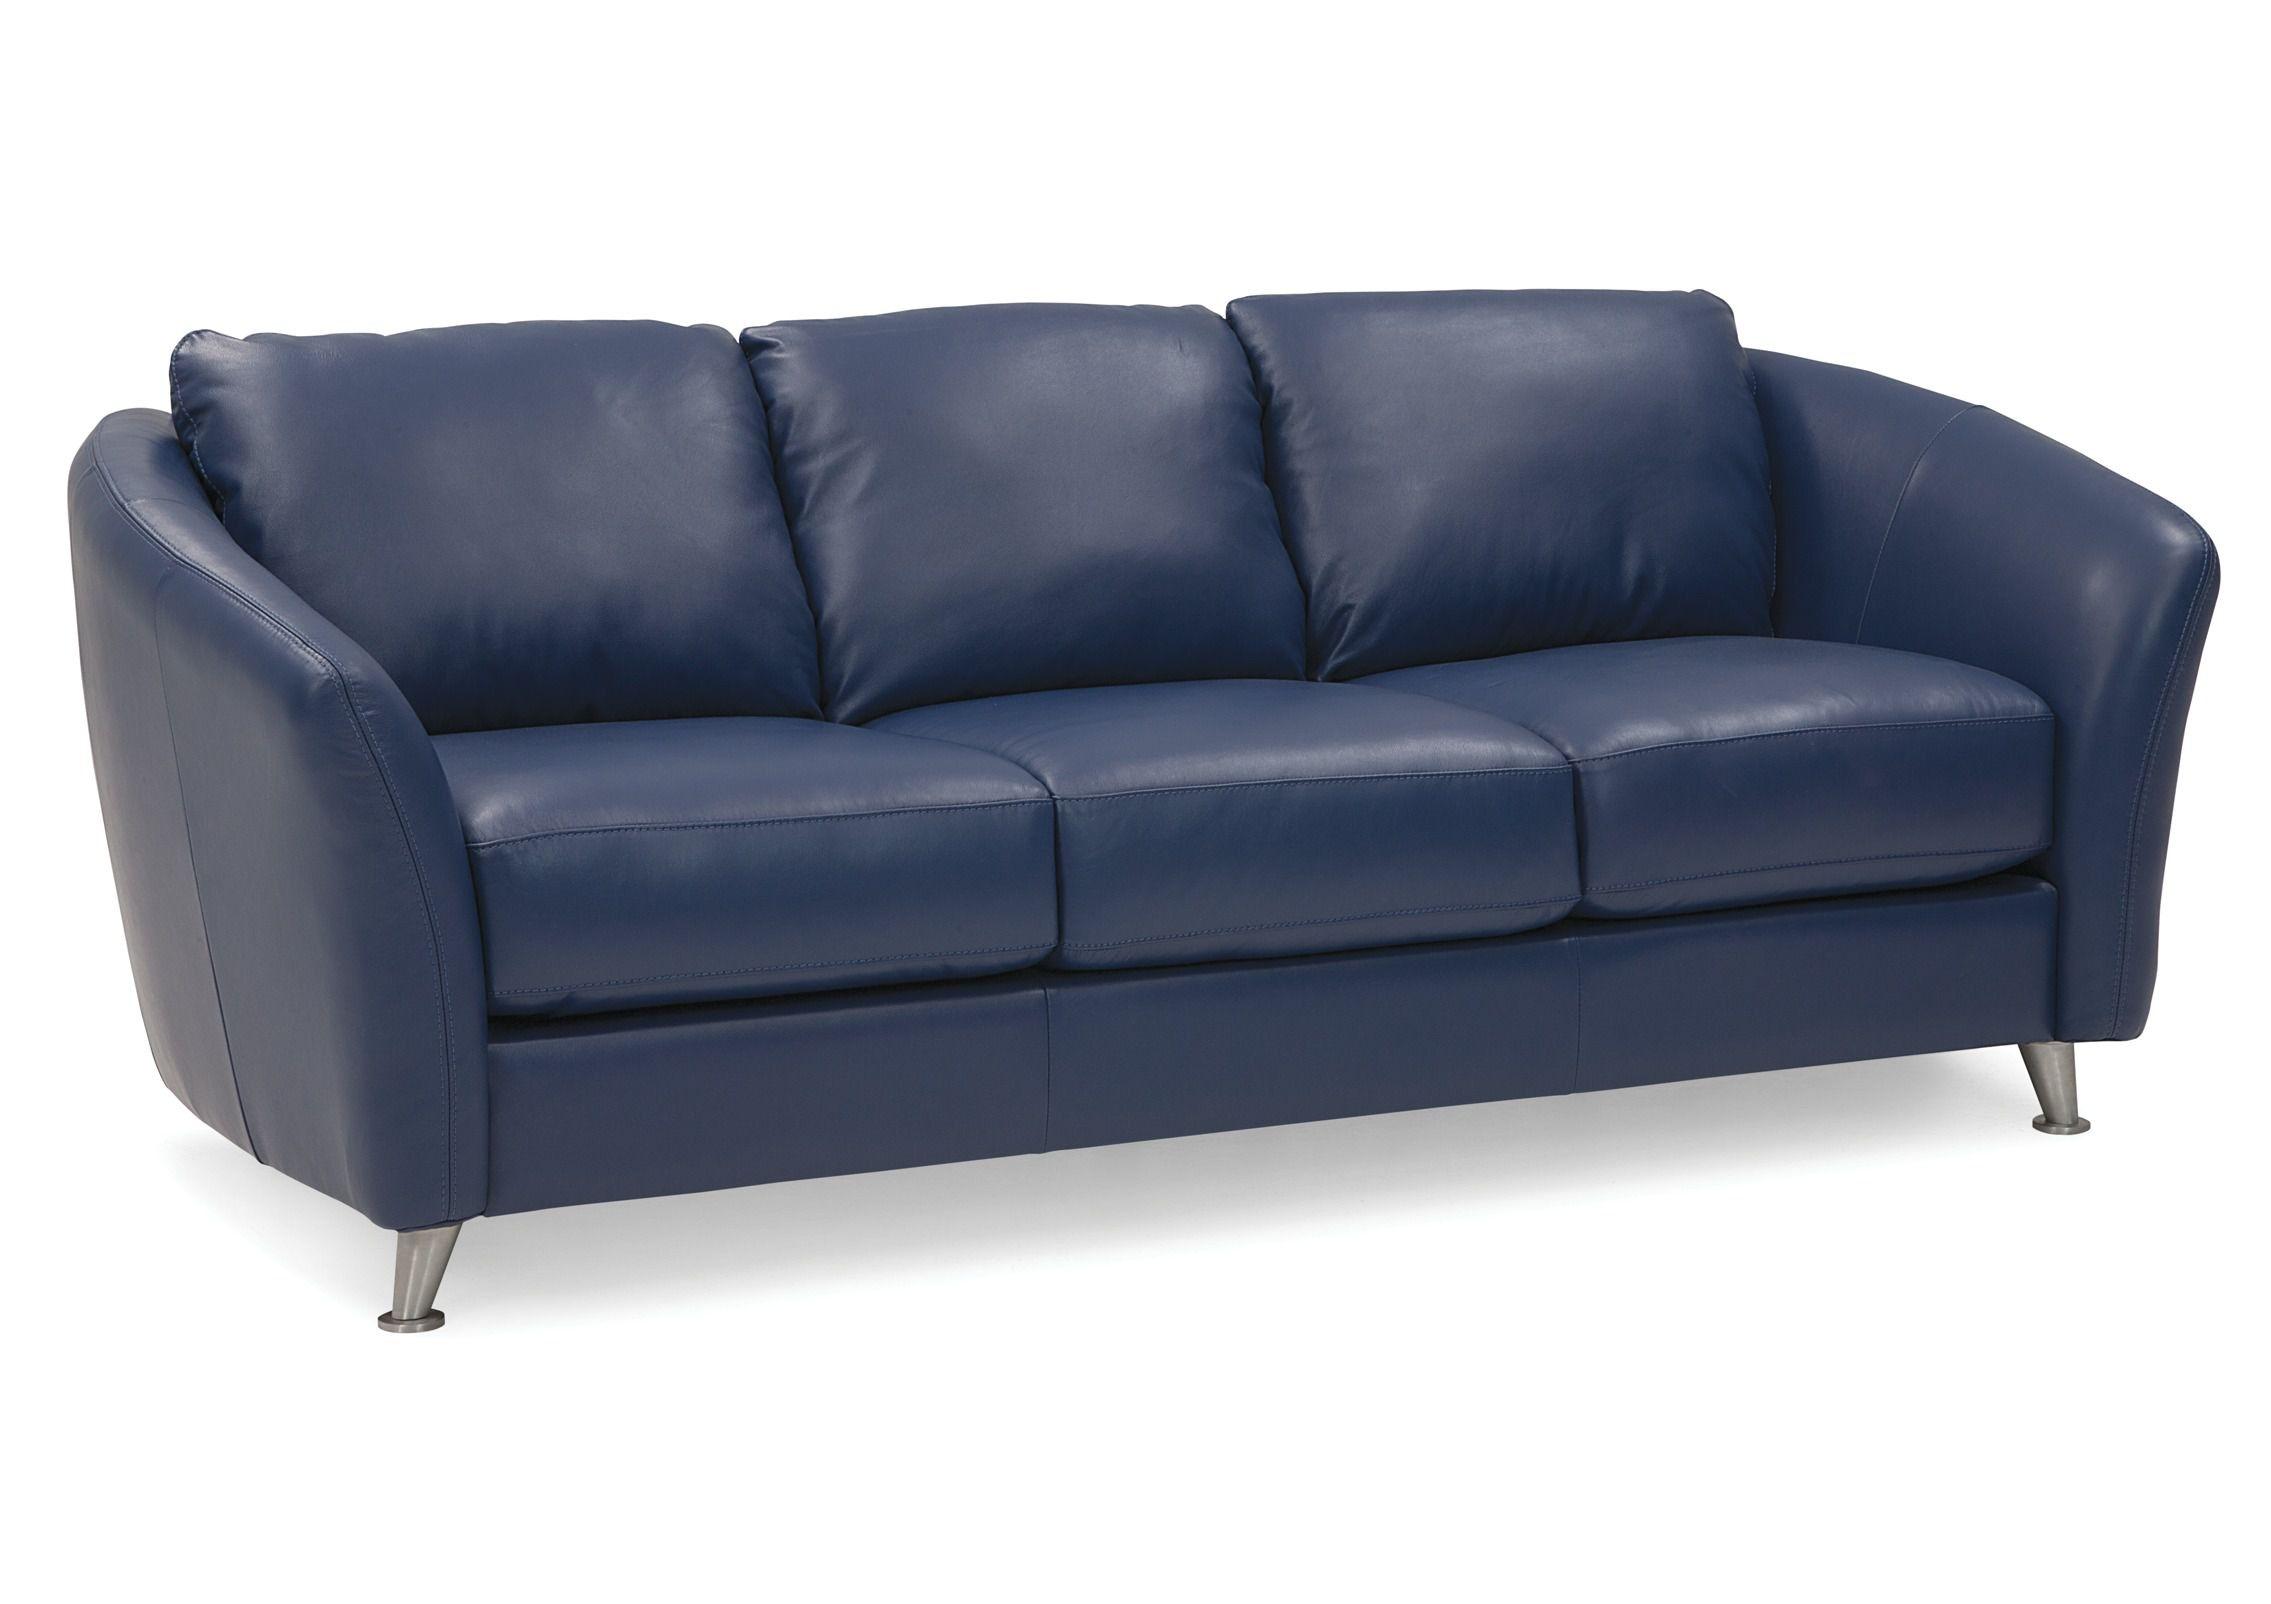 Genial Palliser Furniture Sofa 77427 01